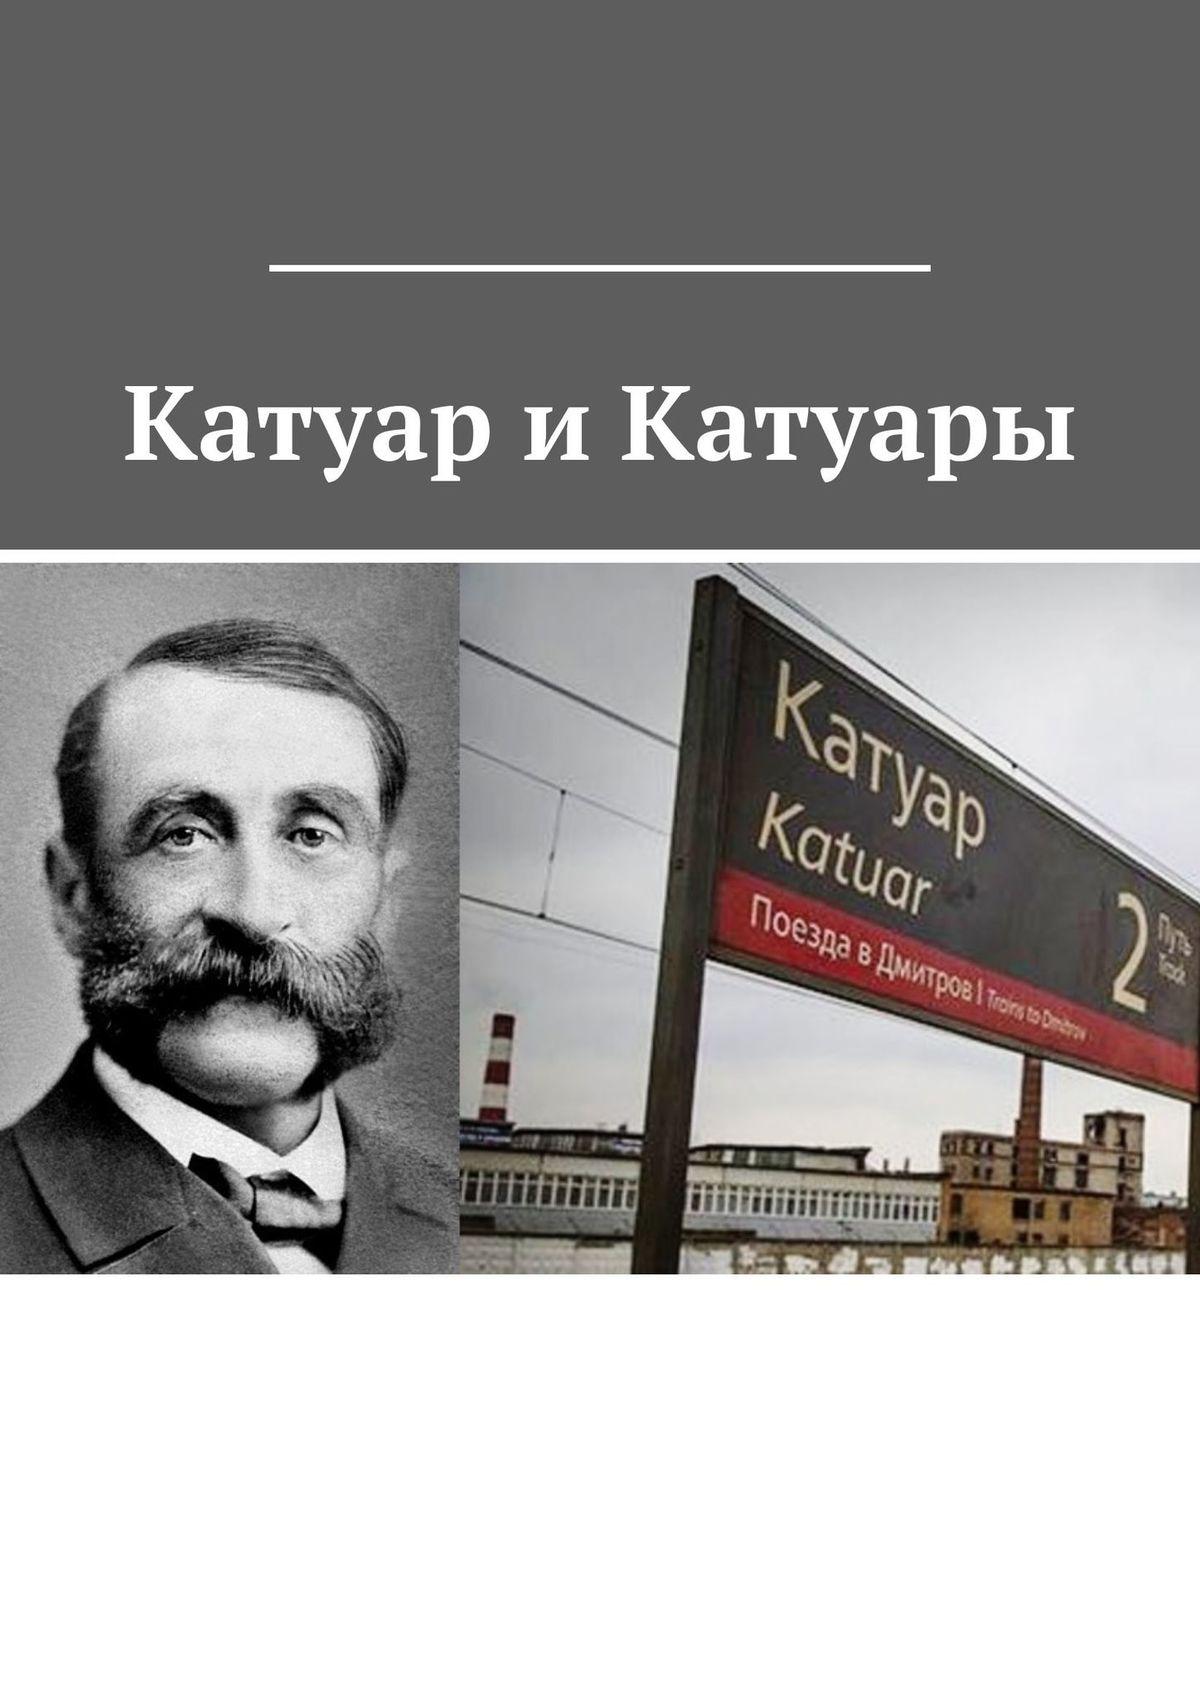 Катуар иКатуары